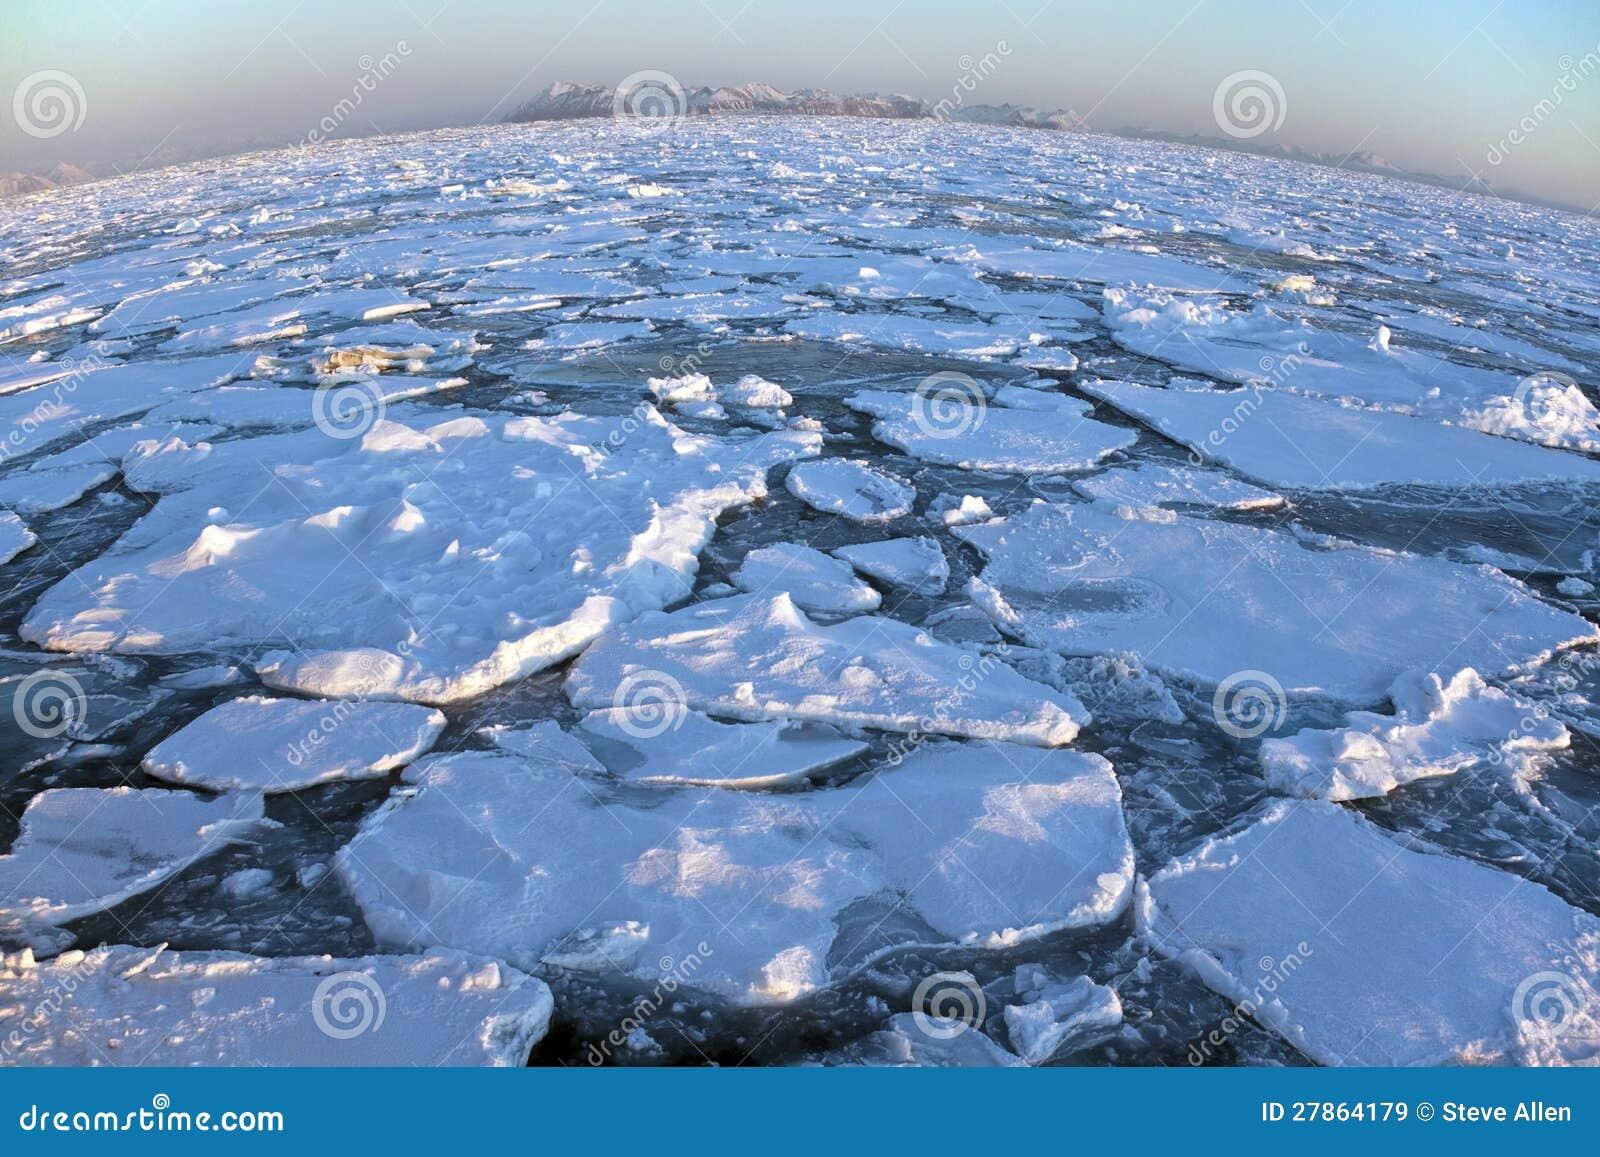 Tapa del mundo - Océano ártico - Groenlandia